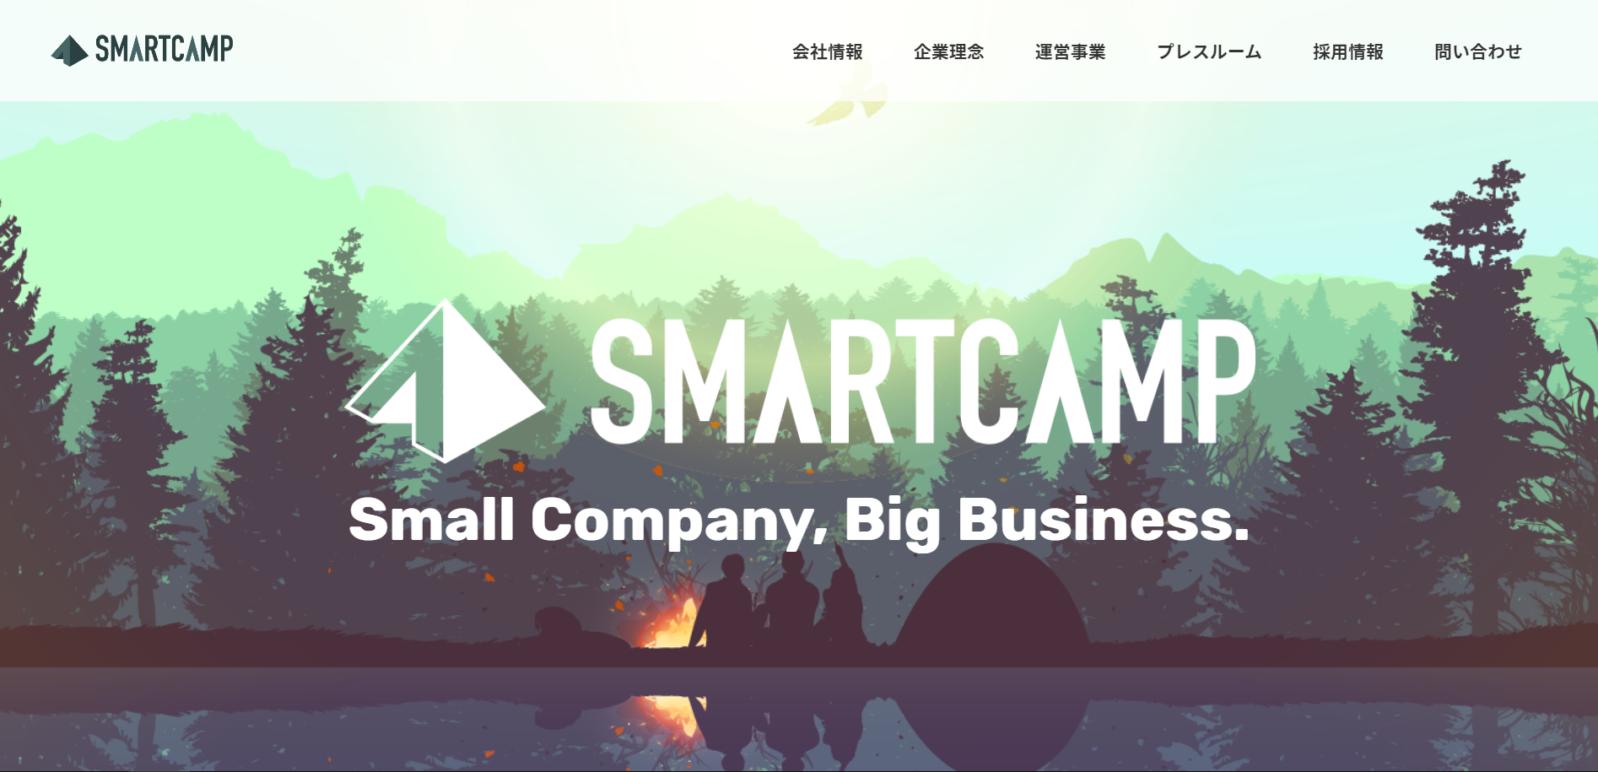 SMARTCAMP(スマートキャンプ)